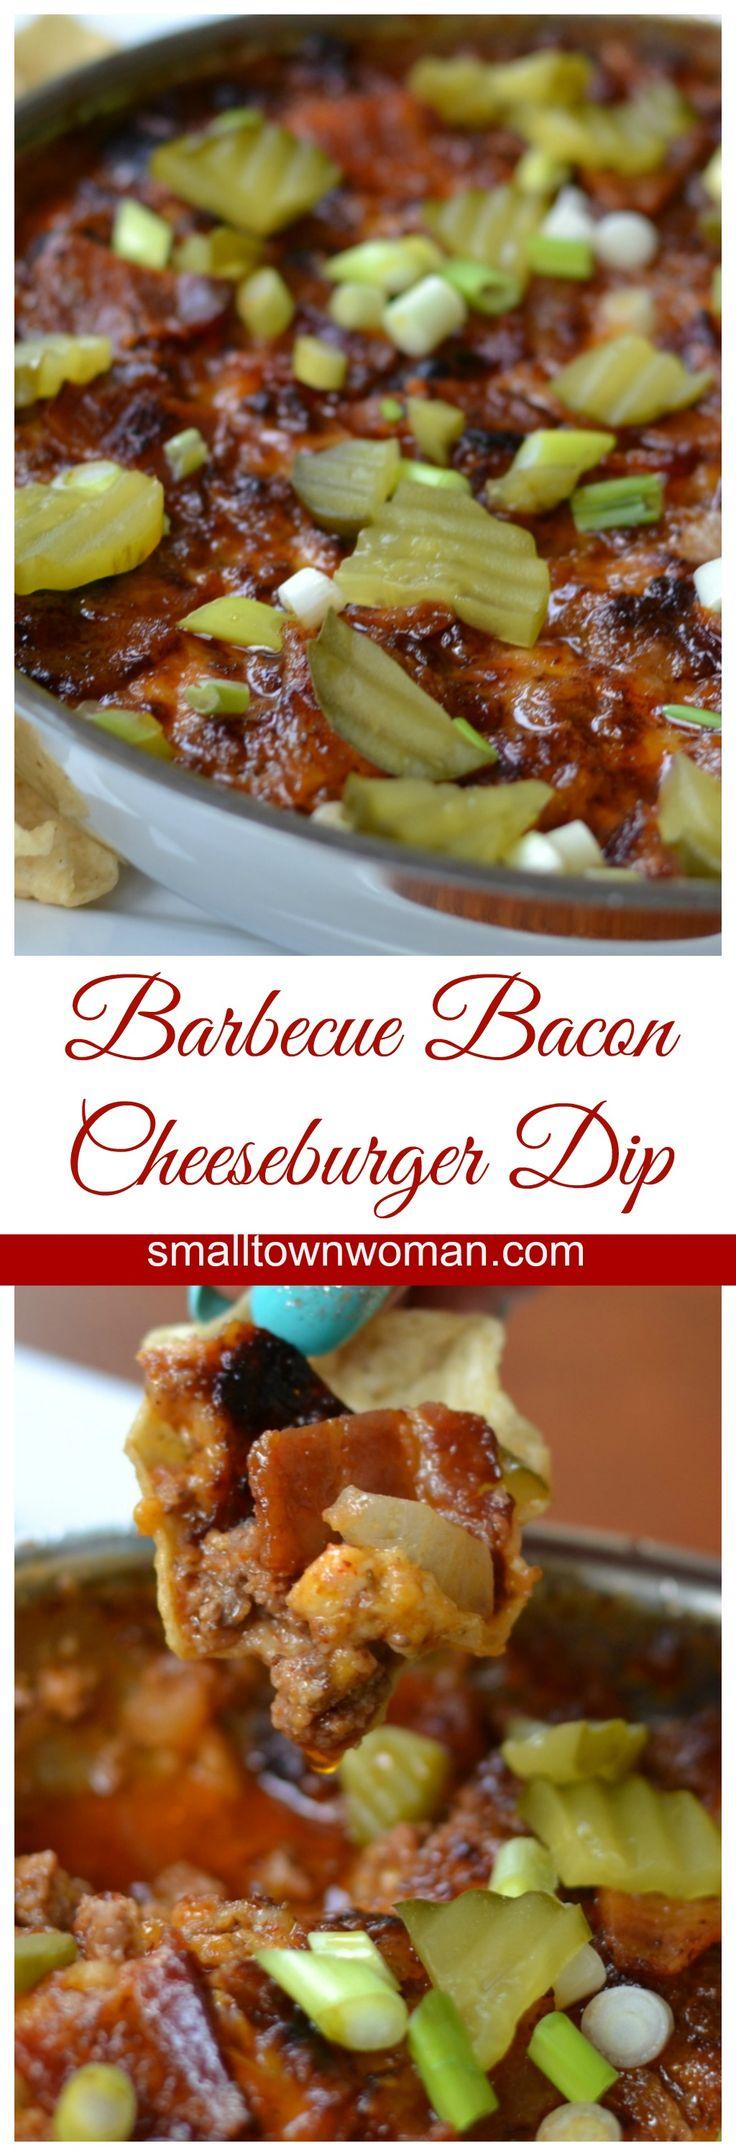 gooey cheeseburger dip recipes dishmaps this easy cheeseburger dip ...